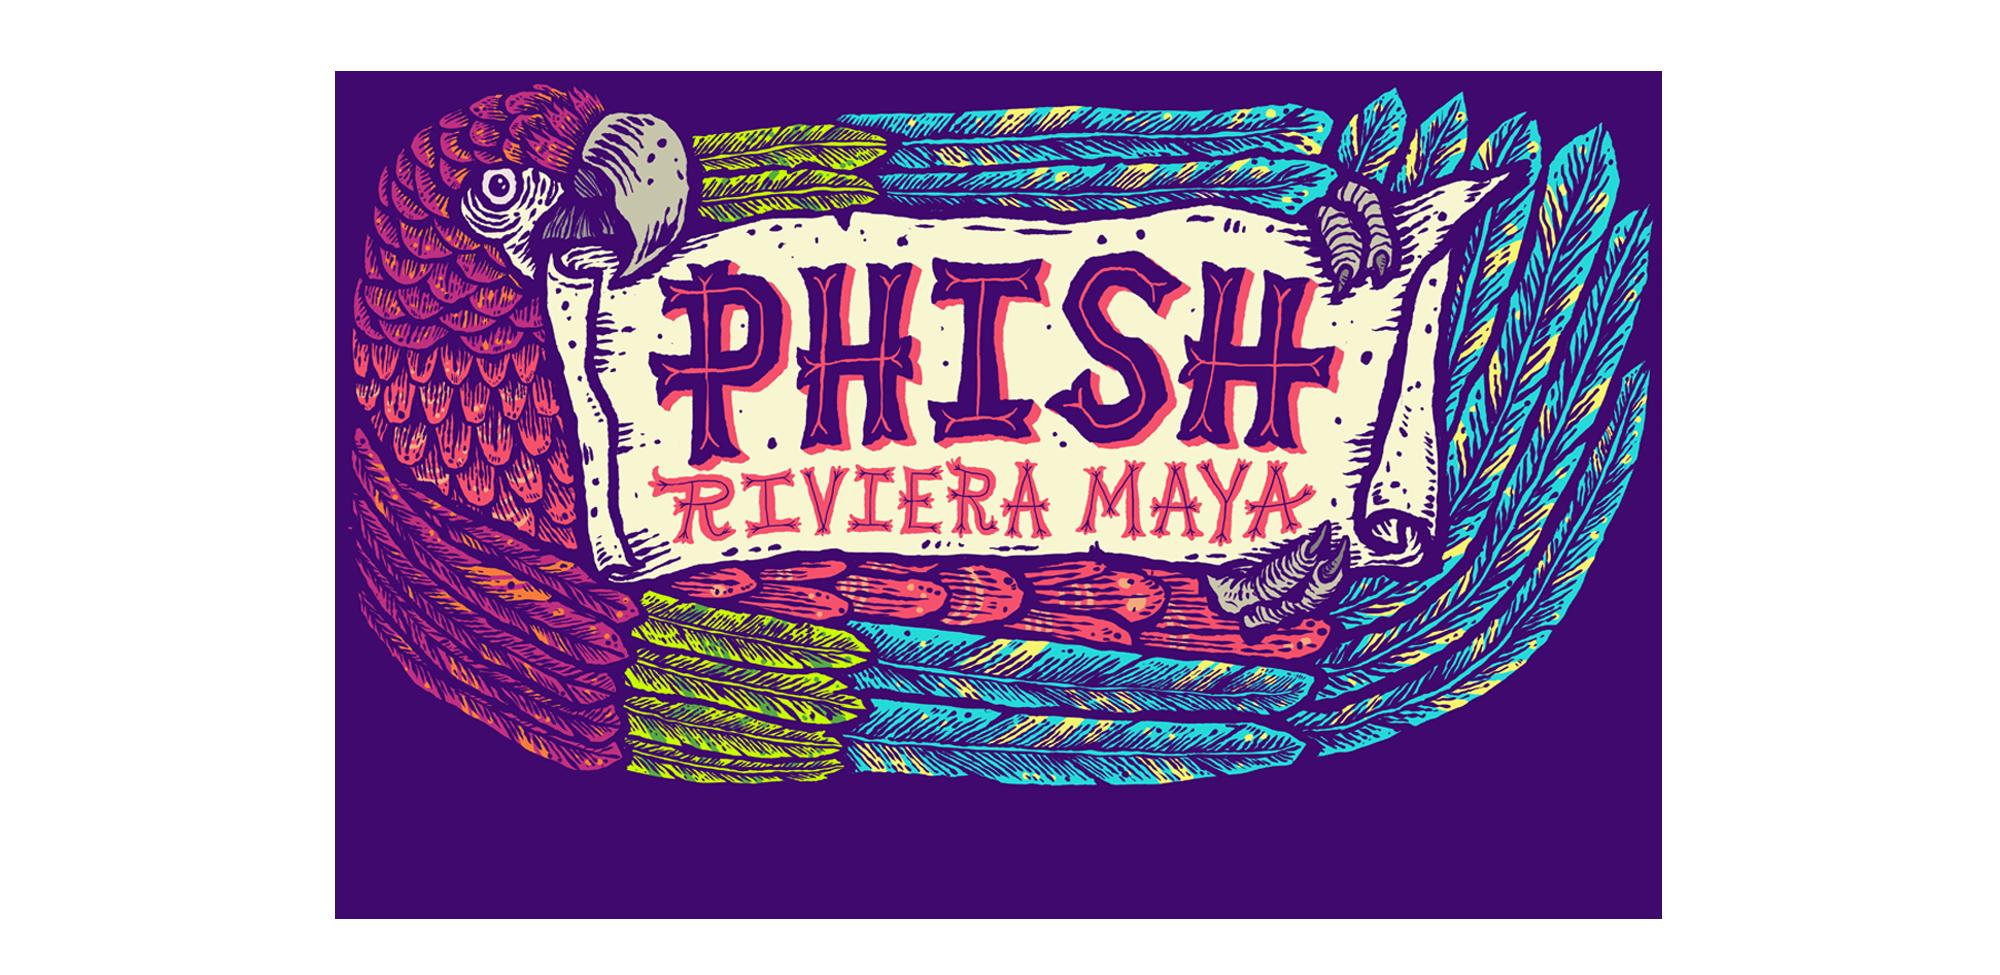 Mexico riviera maya clipart png clipart free stock Phish Riviera Maya 2020 clipart free stock